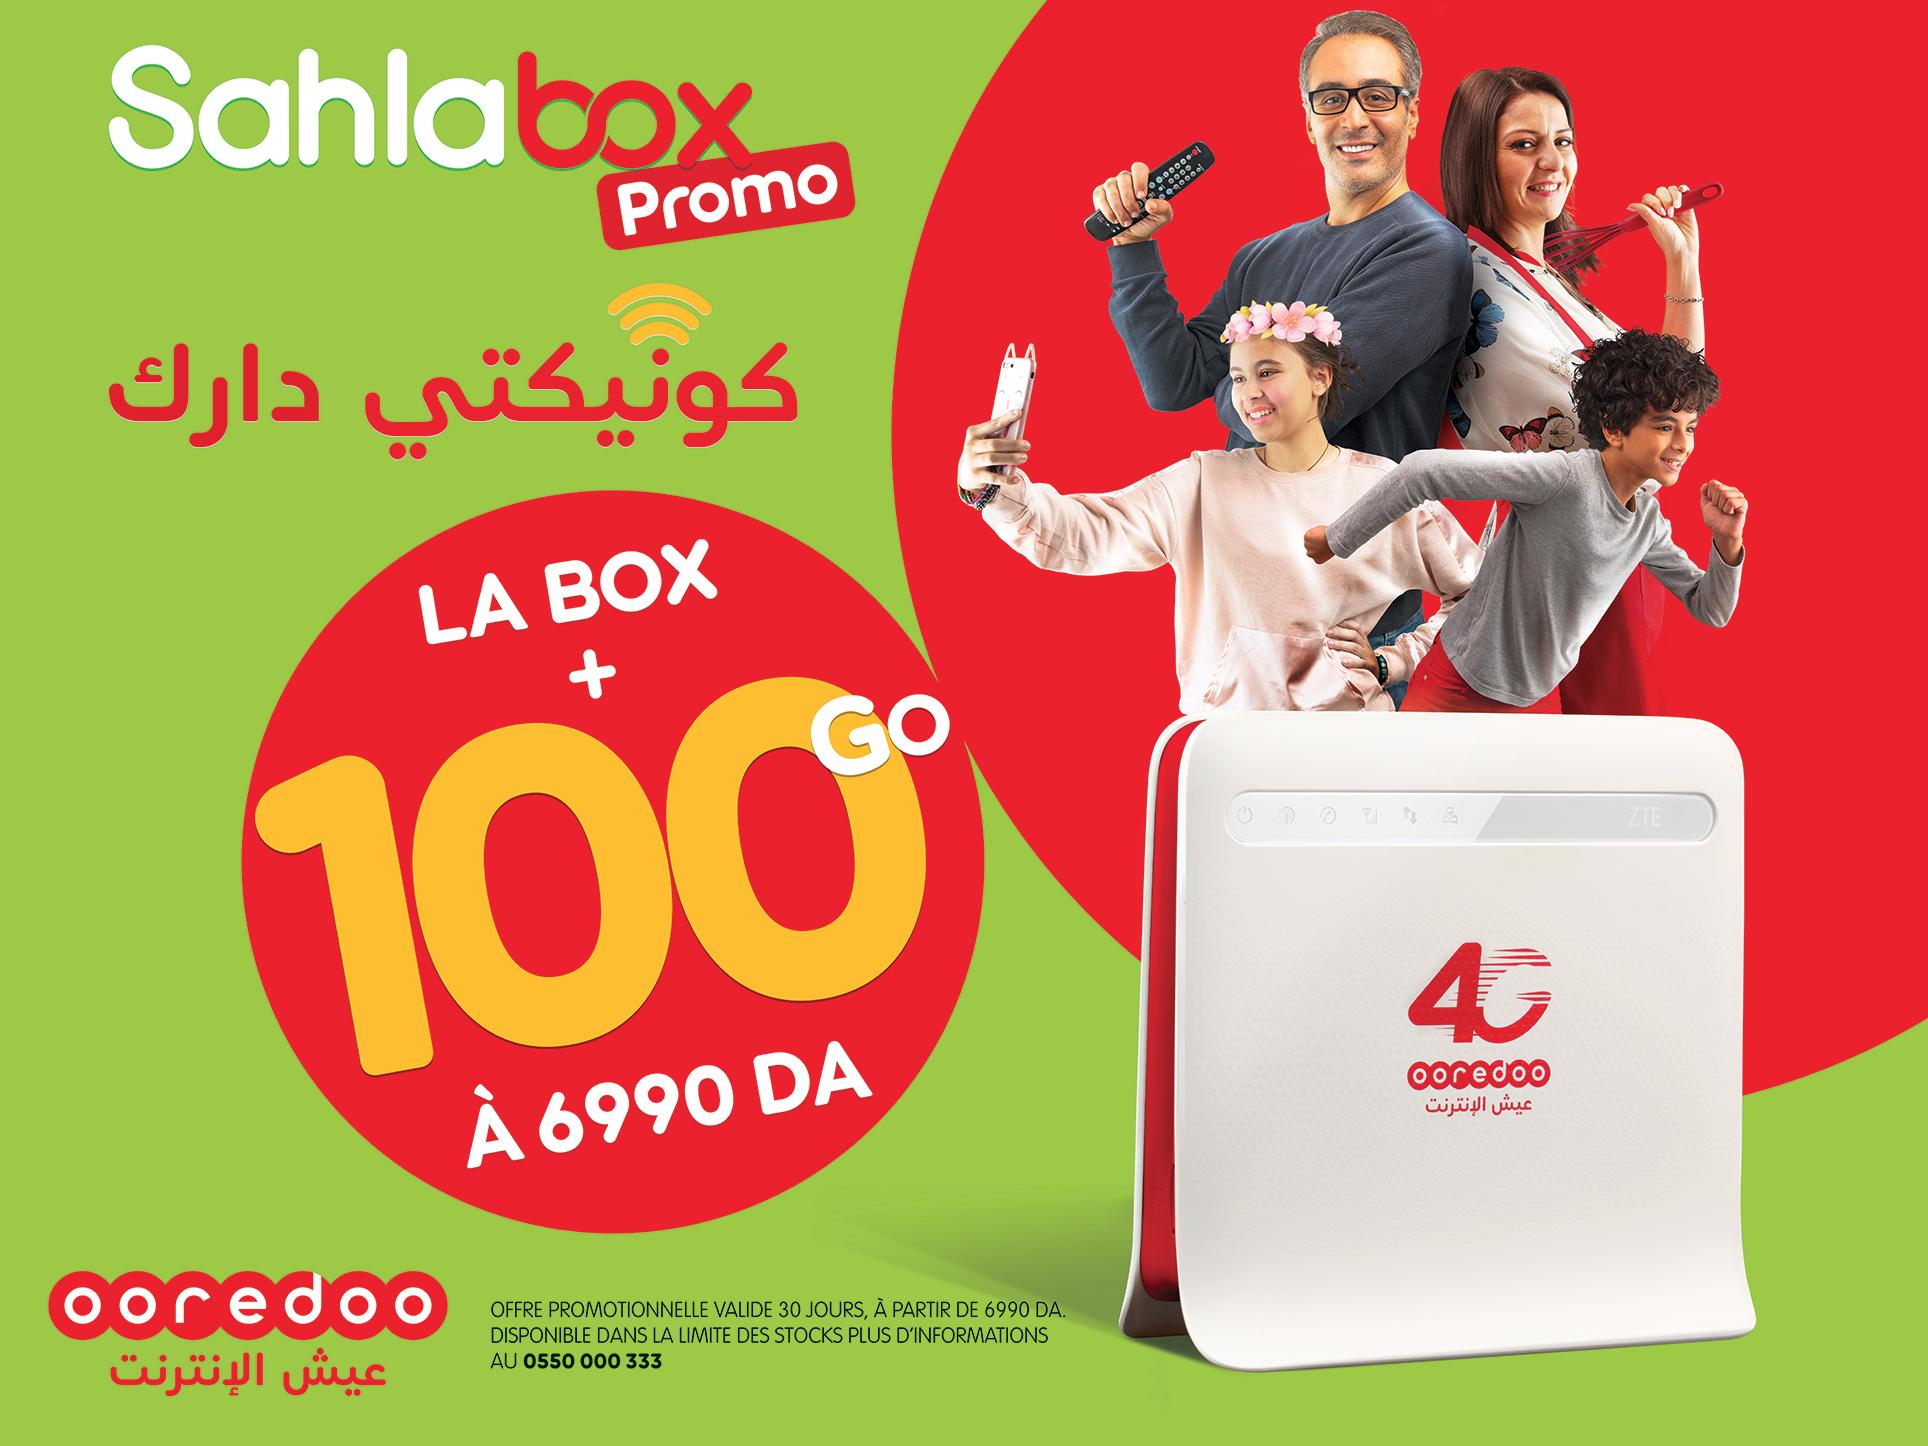 Photo Promo Sahla box